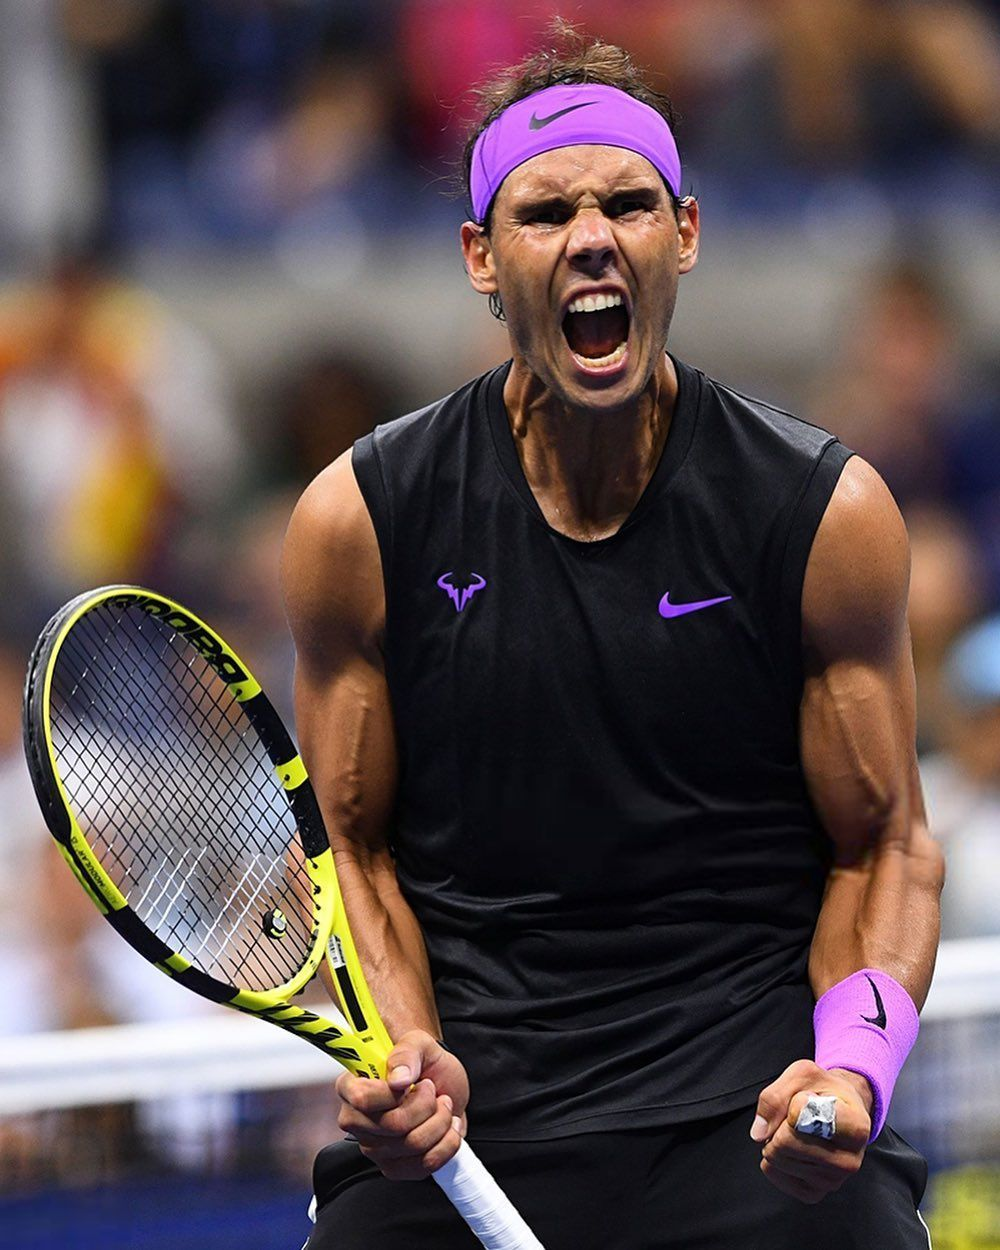 Bianca Andreescu Beats Serena Williams To Win U S Open Pictures Reuters In 2020 Serena Williams Tennis Serena Williams Tennis Match